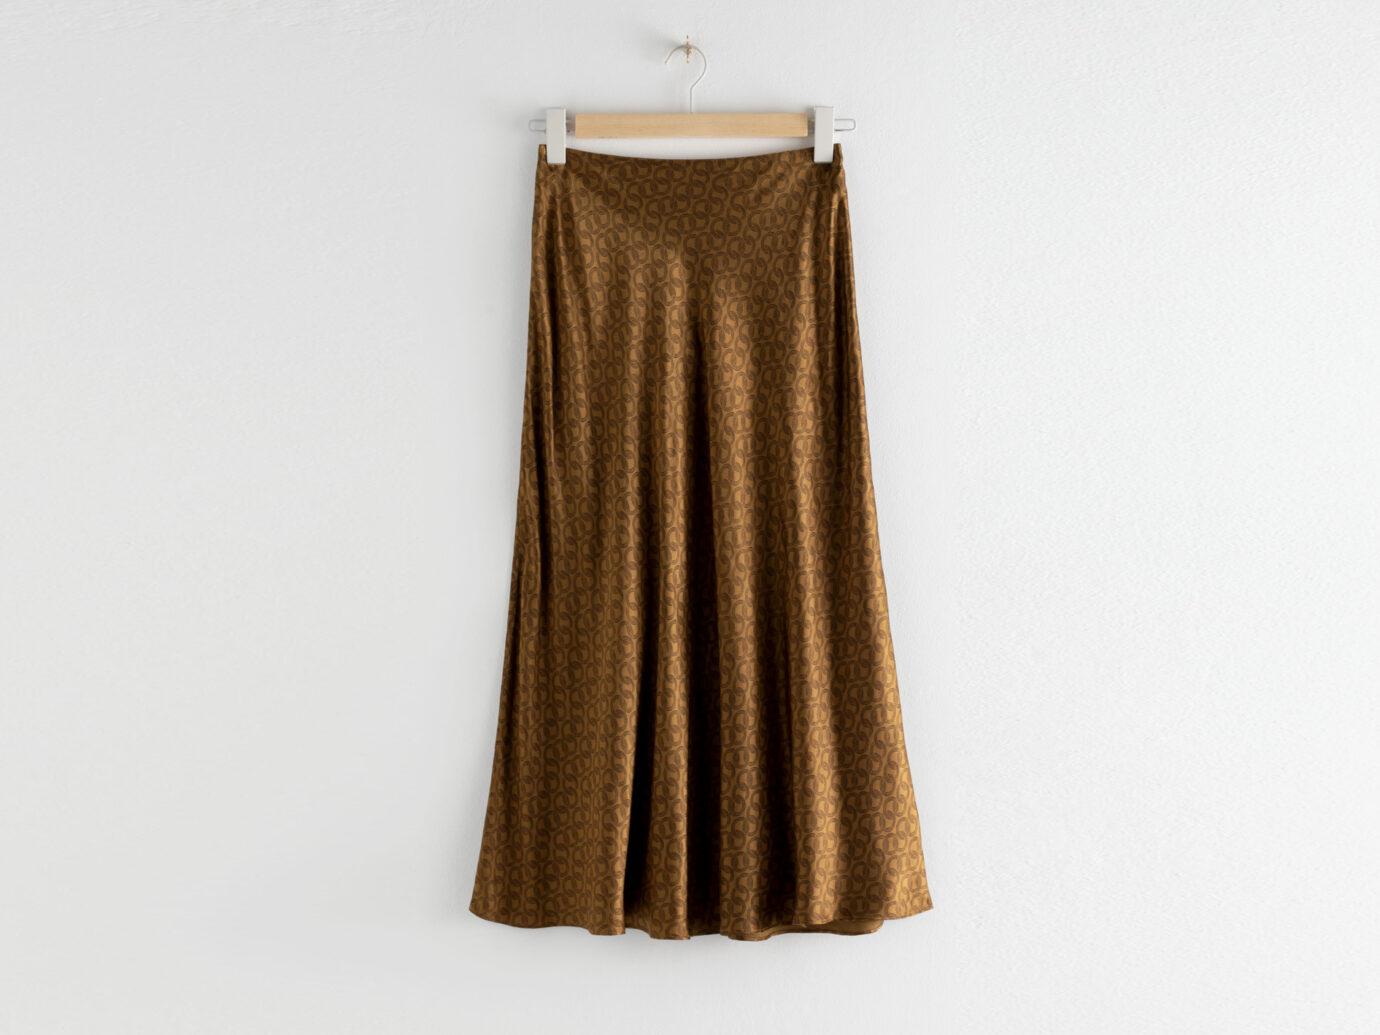 & Other Stories Chain Print Satin Midi Skirt